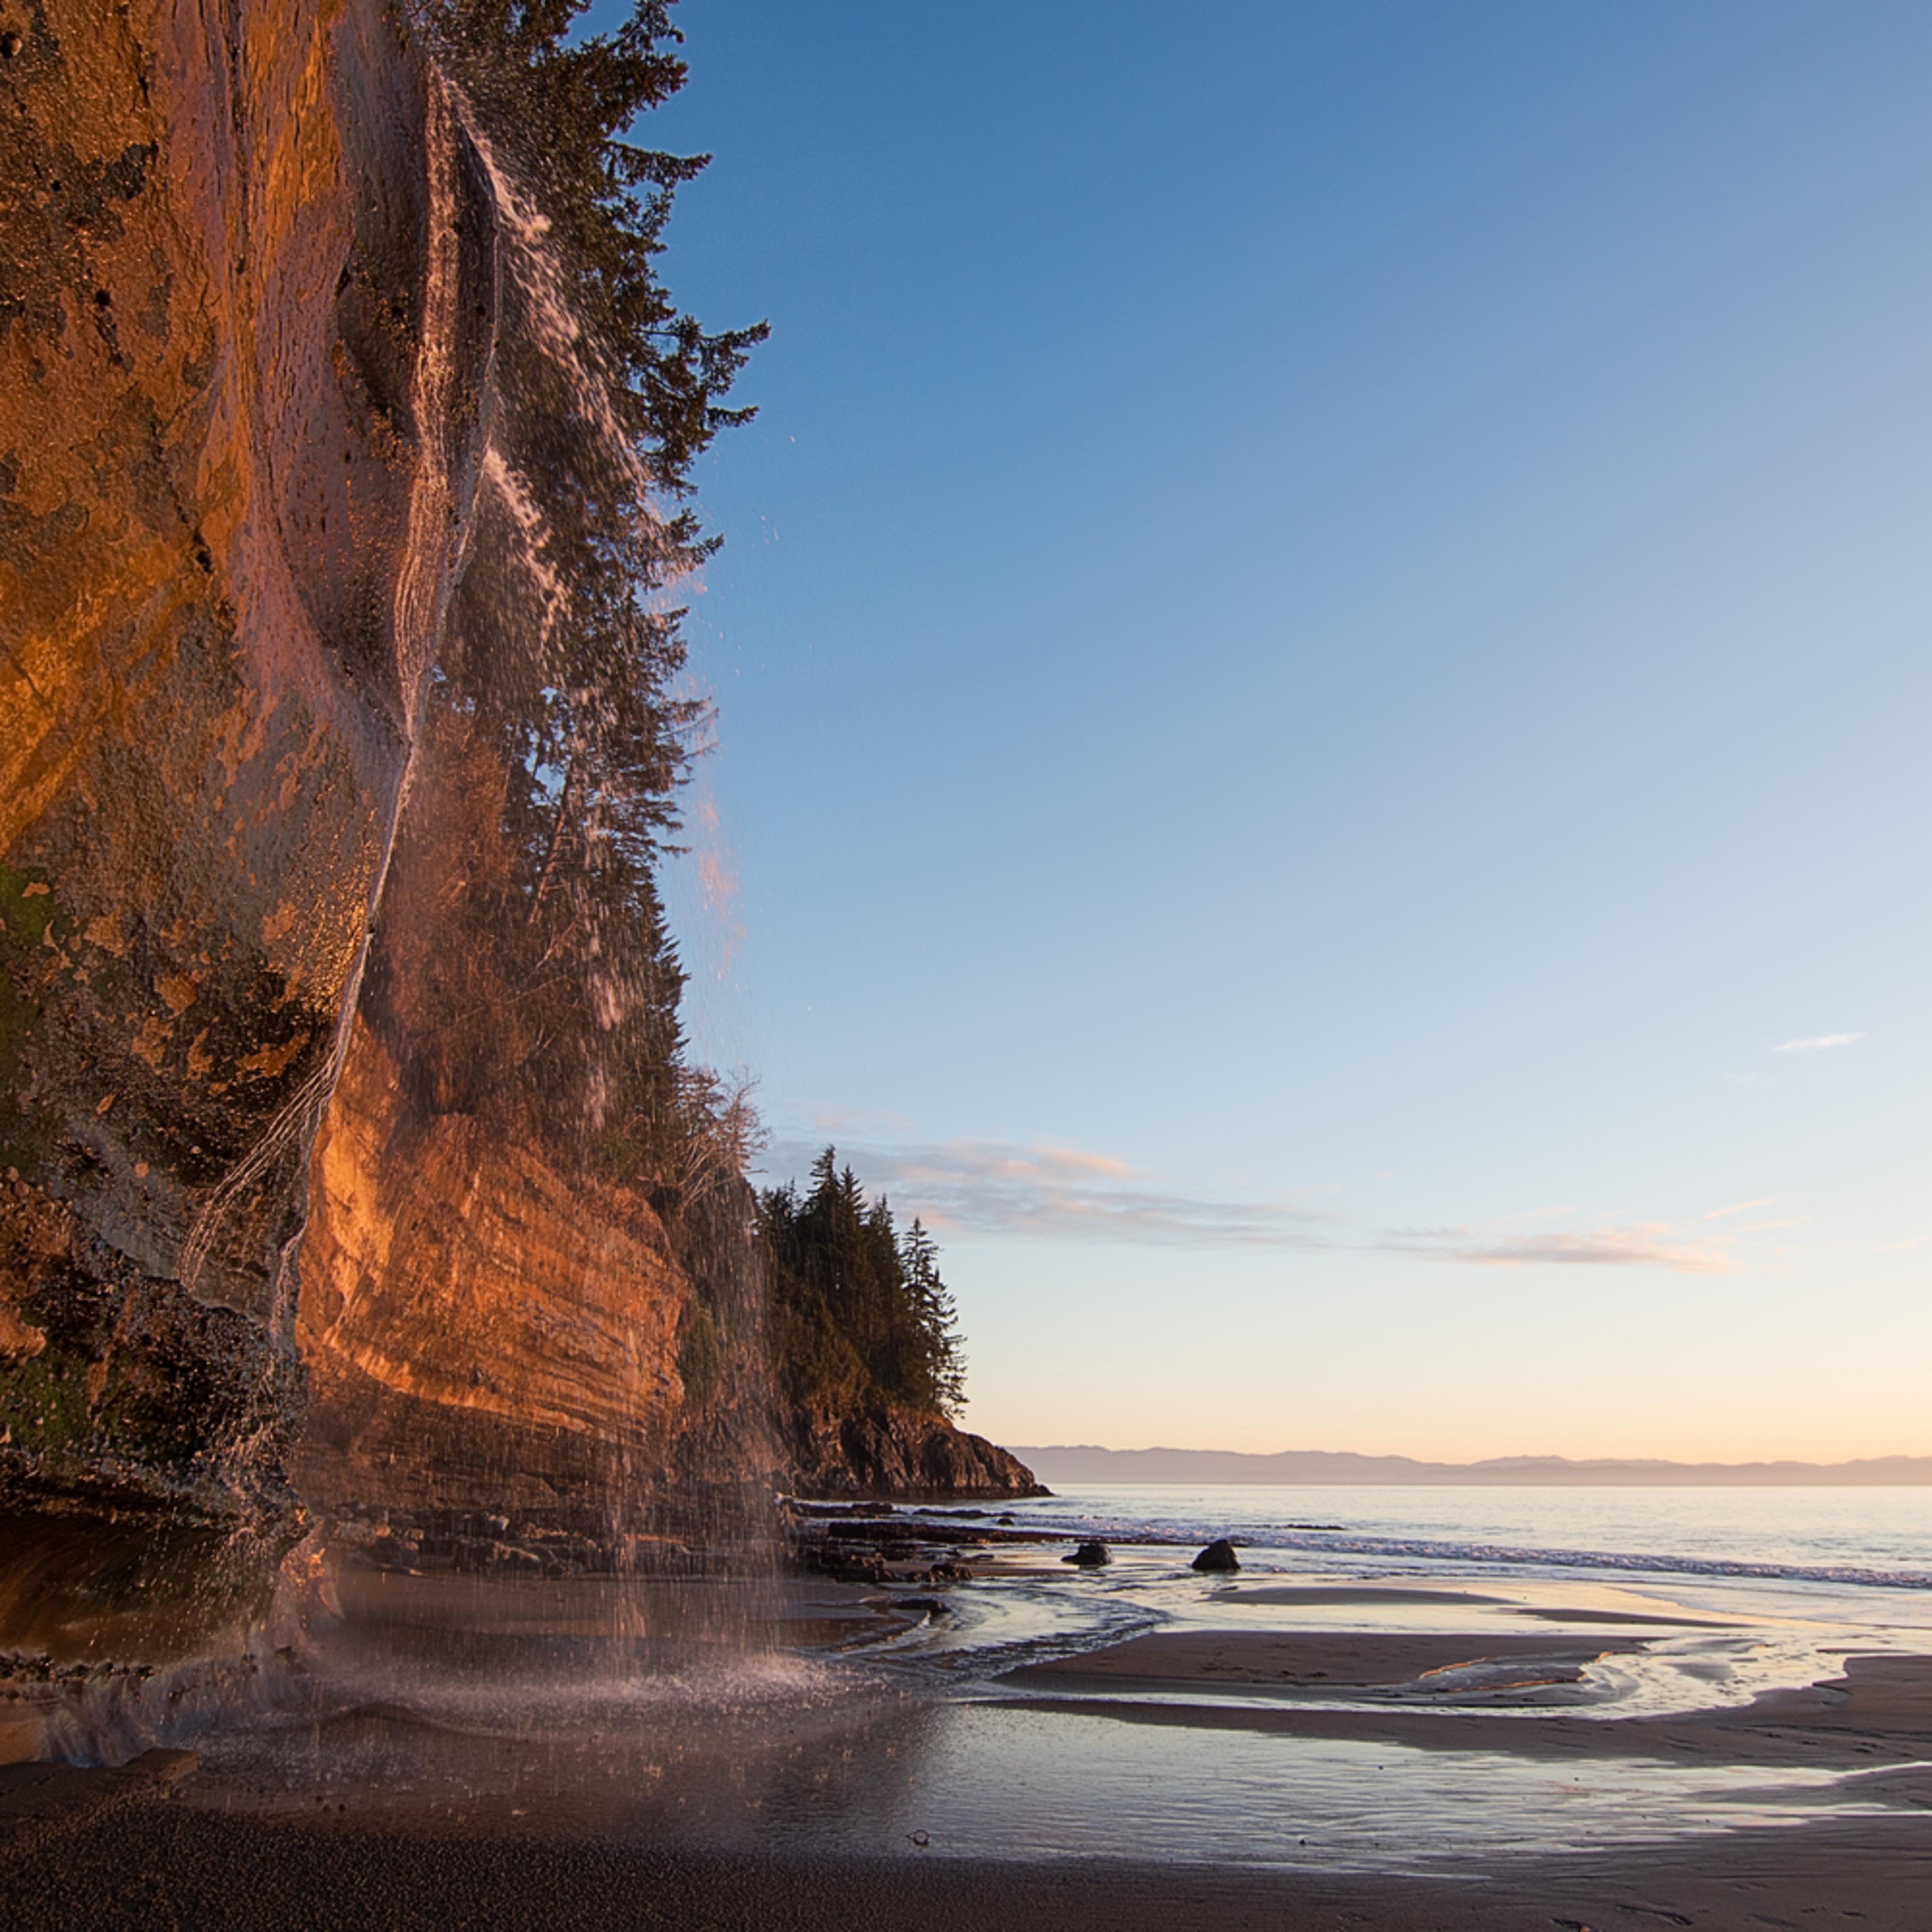 Mystic beach vancouver island heather k jones y4cfg0